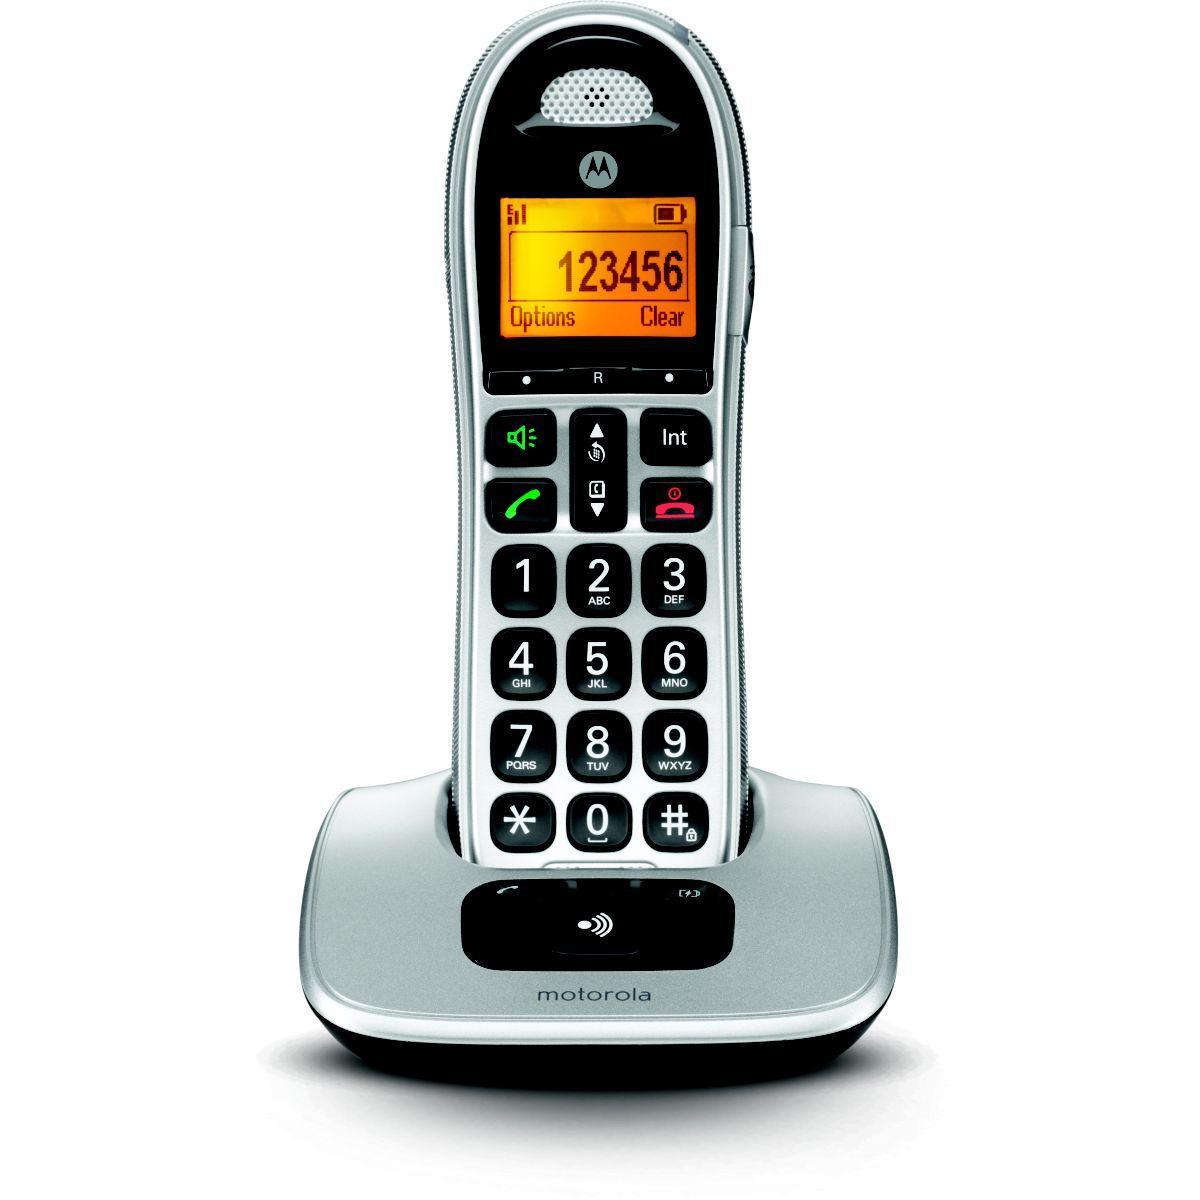 Téléphone motorola motorola cd301 silver - 10% de remise immédiate avec le code : multi10 (photo)